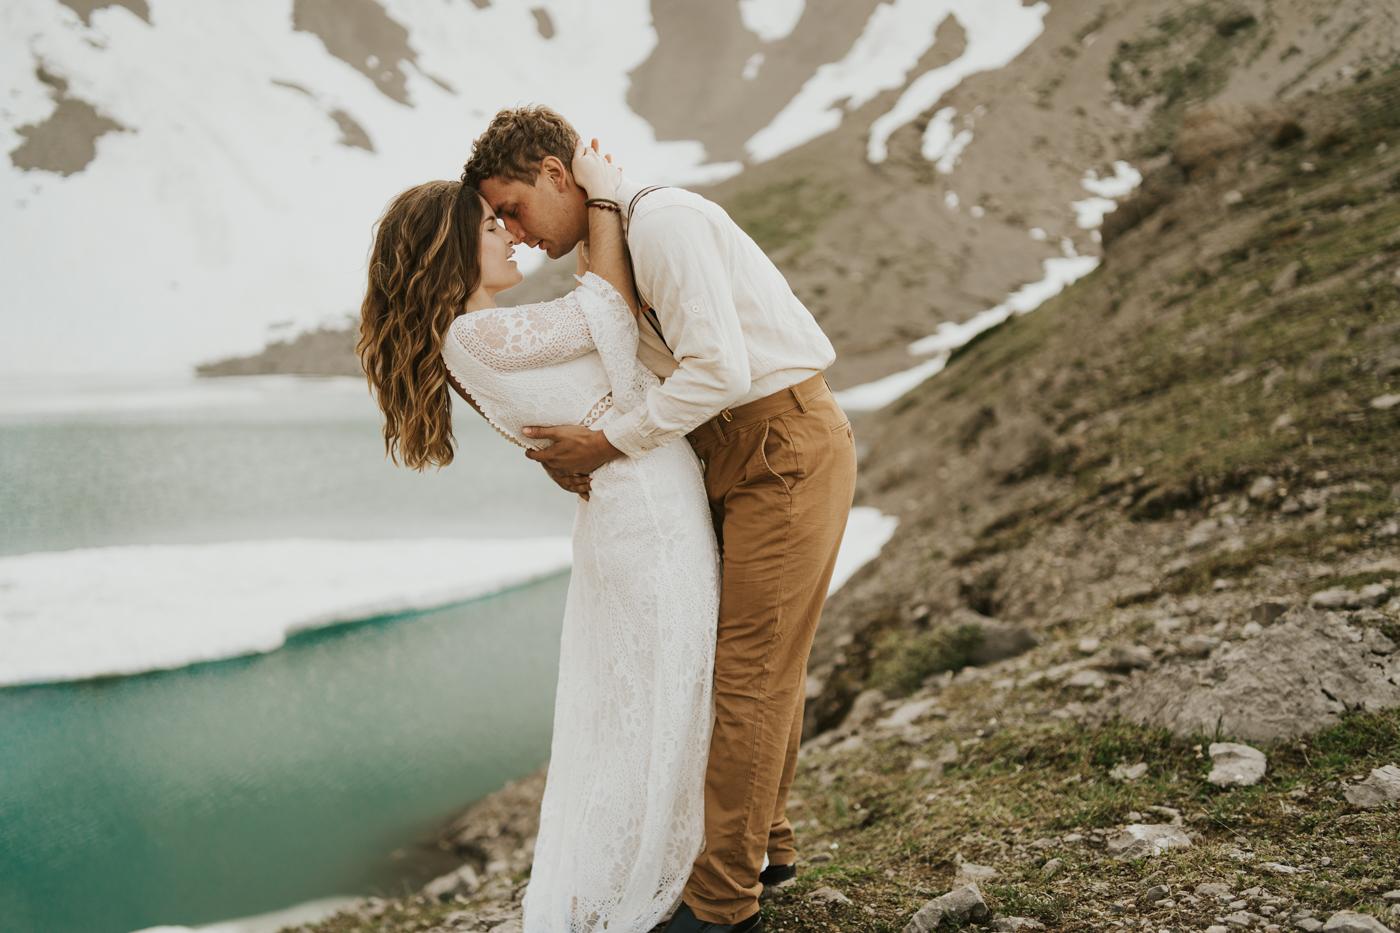 tyraephotography_photographer_wedding_elopement_engagement_photography-07603.jpg